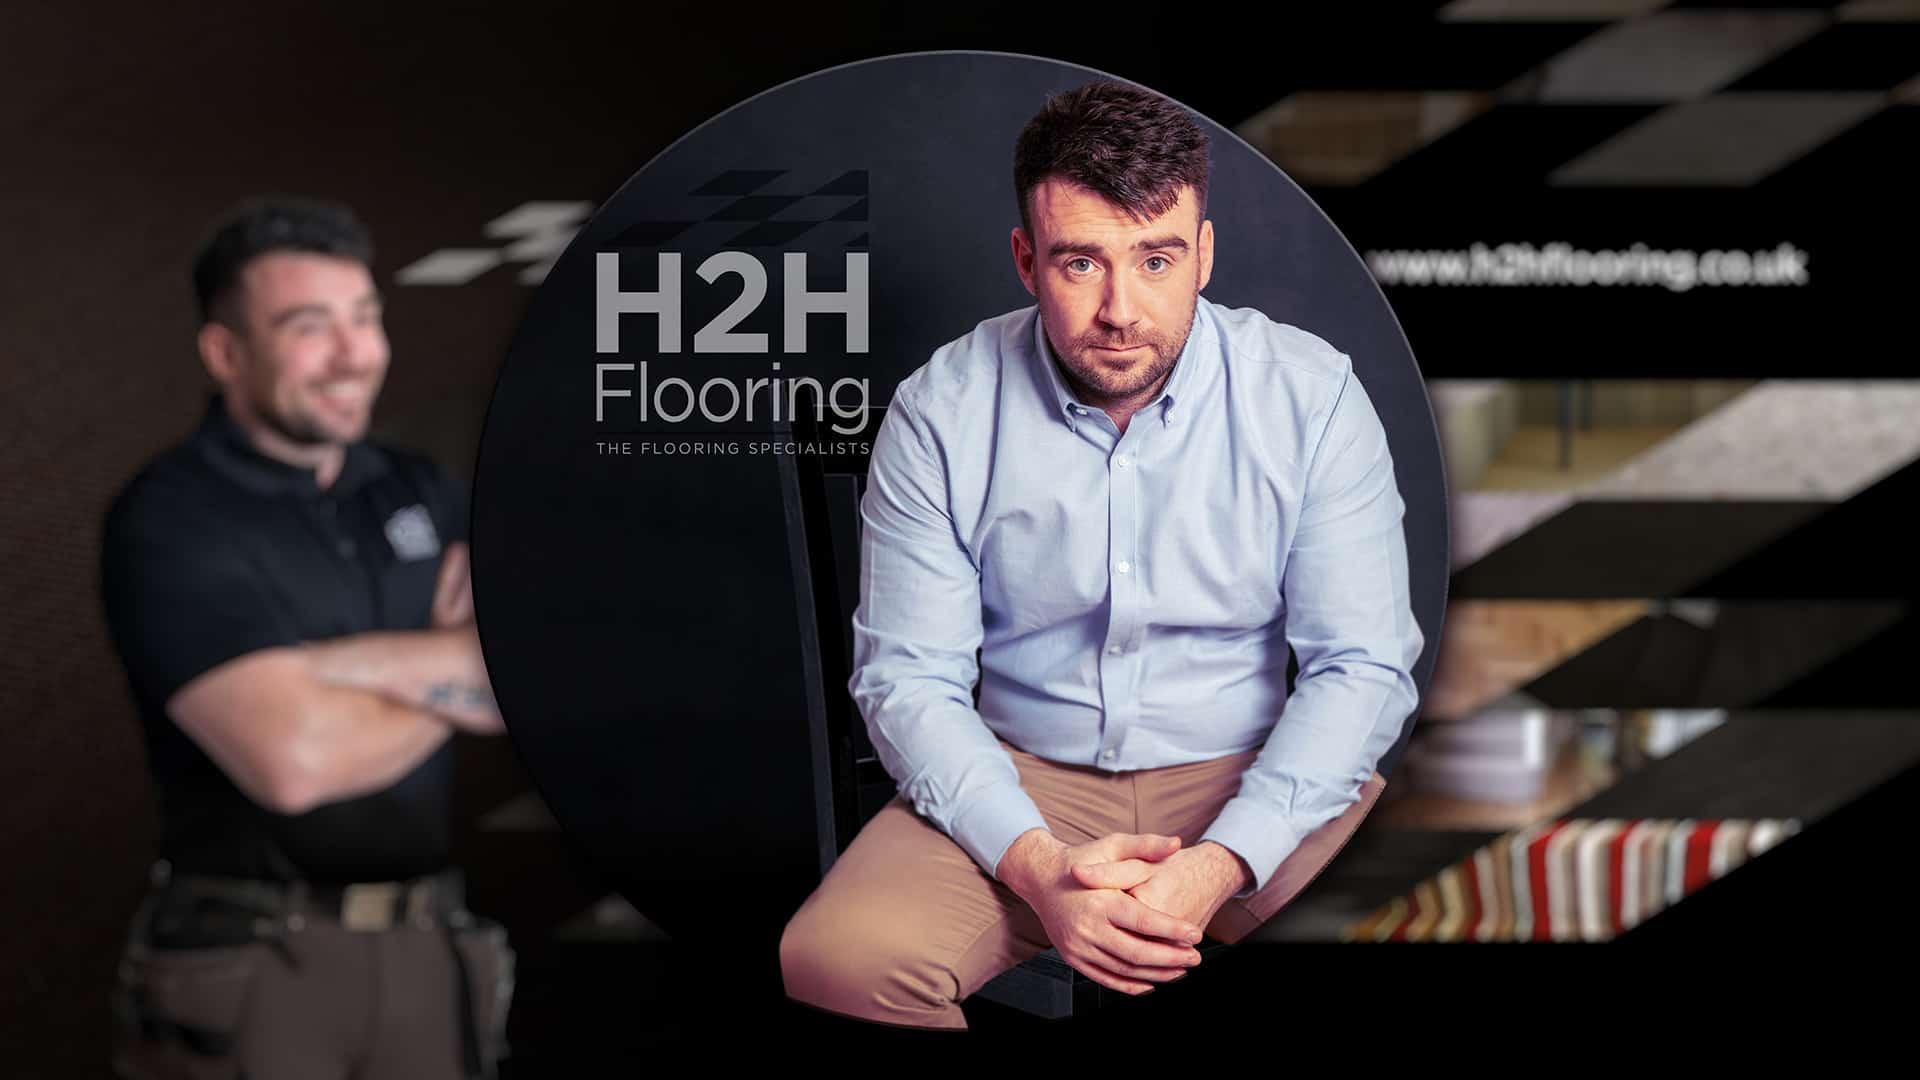 H2H Image 7